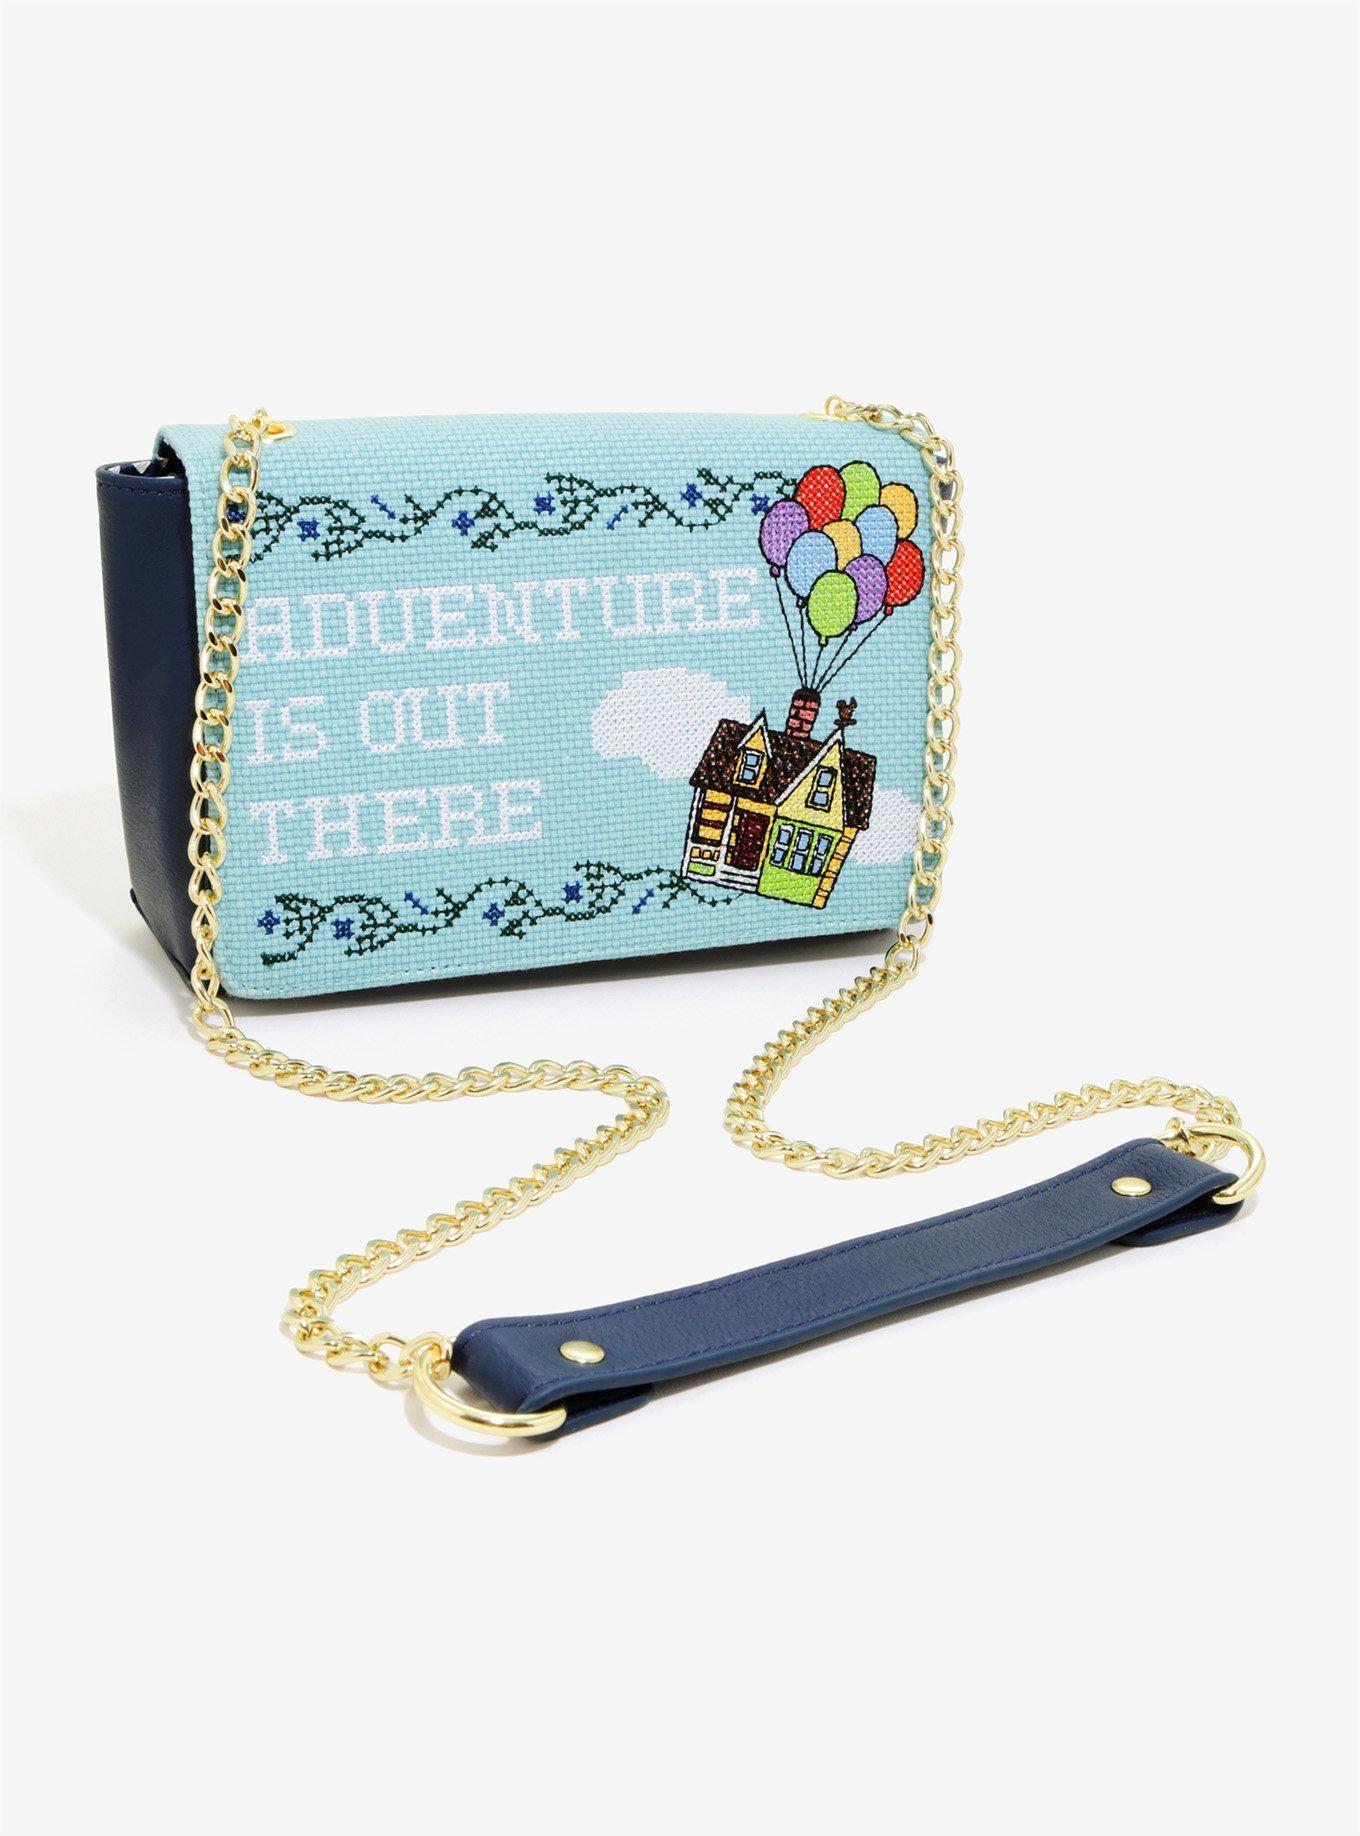 045cff78e73 Loungefly Disney Pixar Up Adventure Crossbody Bag - BoxLunch Exclusive